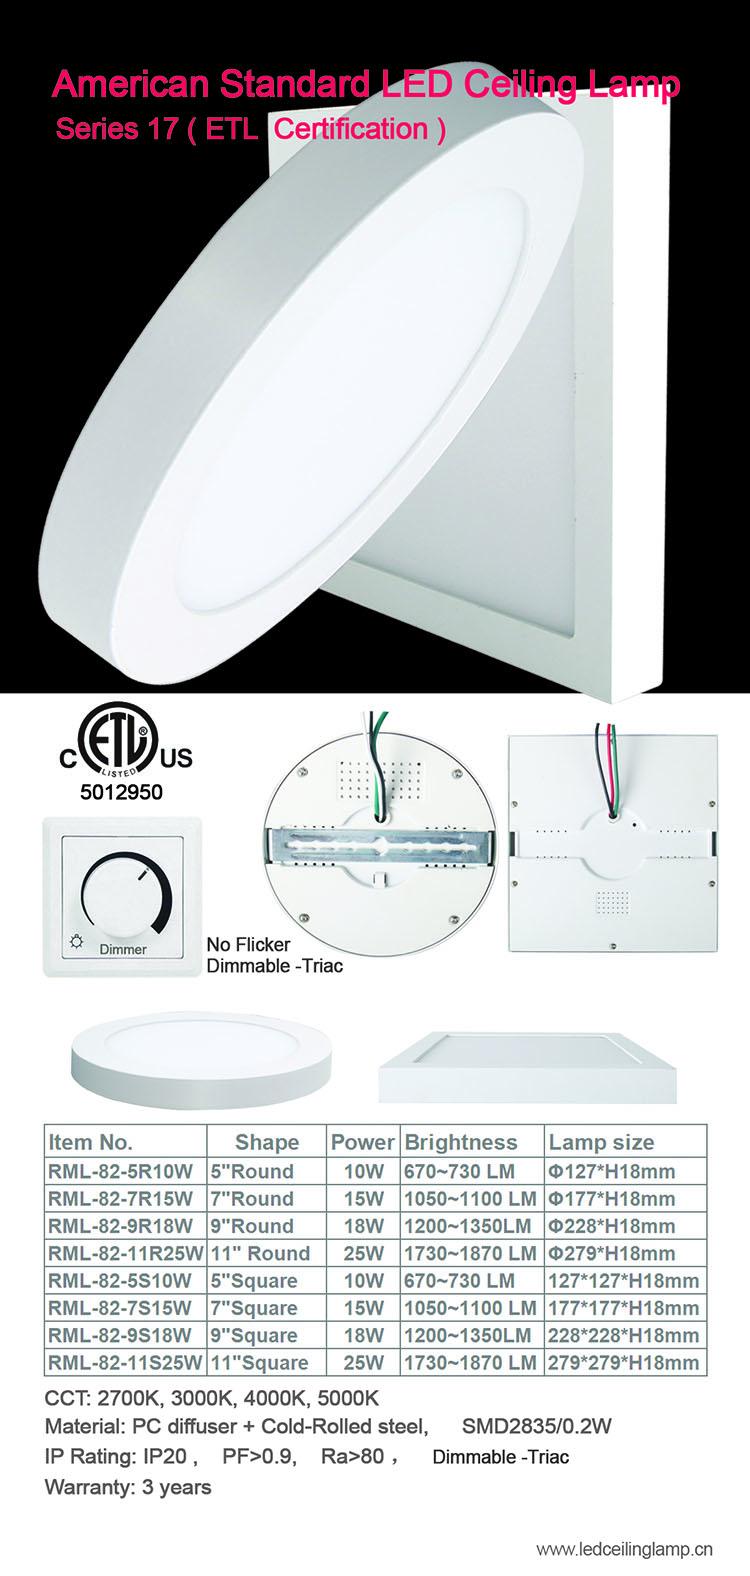 Cina Vendor Etl Partai Besar Pabrik Permukaan Dipasang Bulat Panel LED Light dengan 10 W 15 W 18 W 25 W